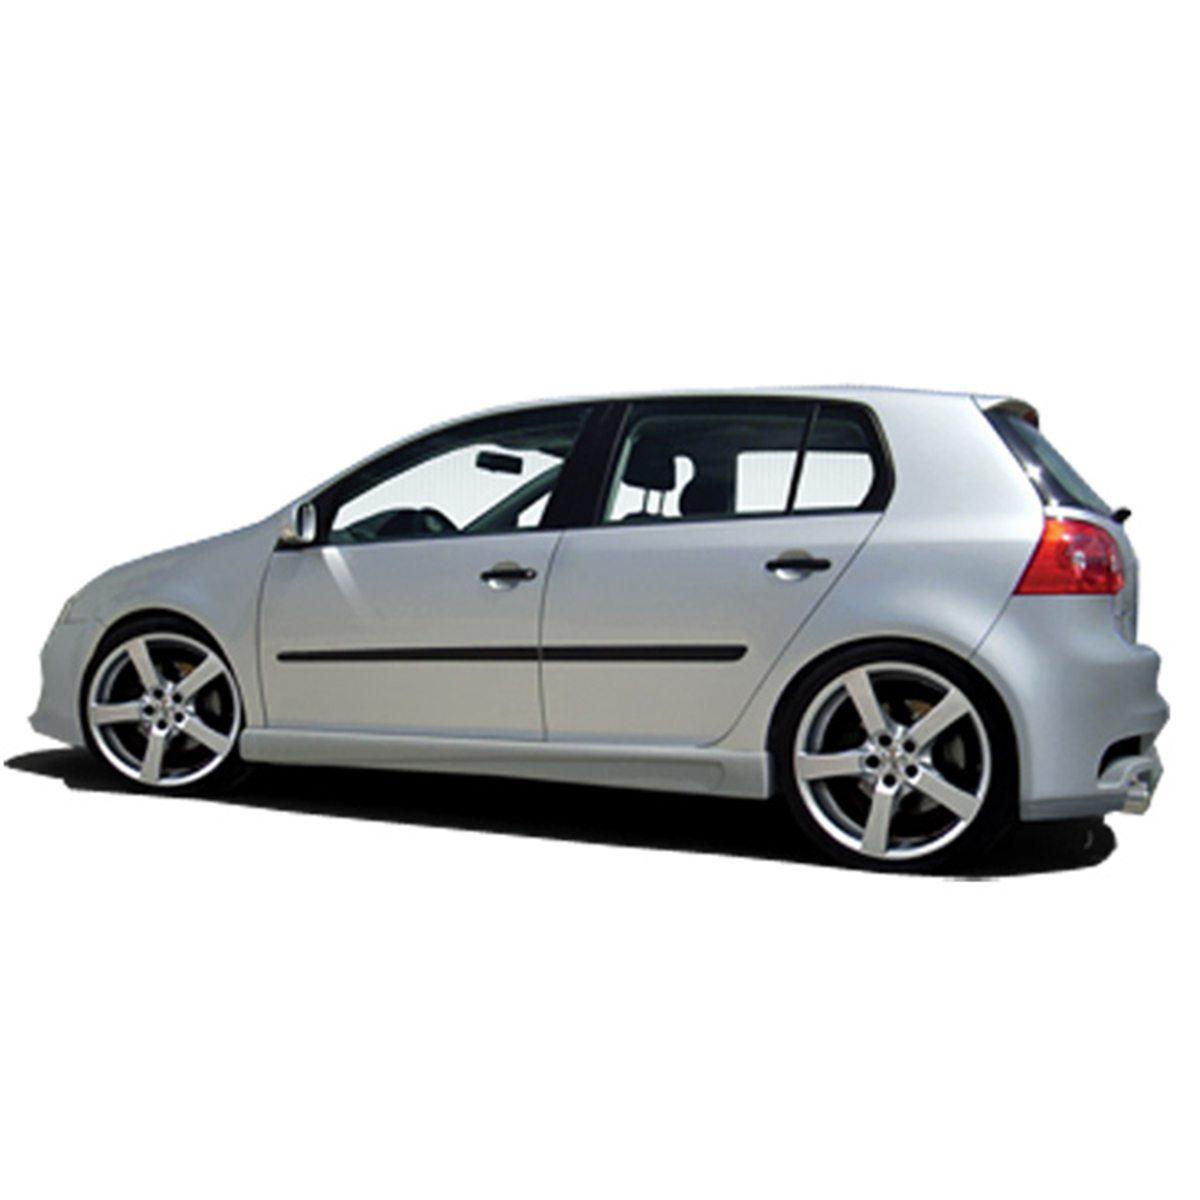 VW-Golf-V-Meister-Emb